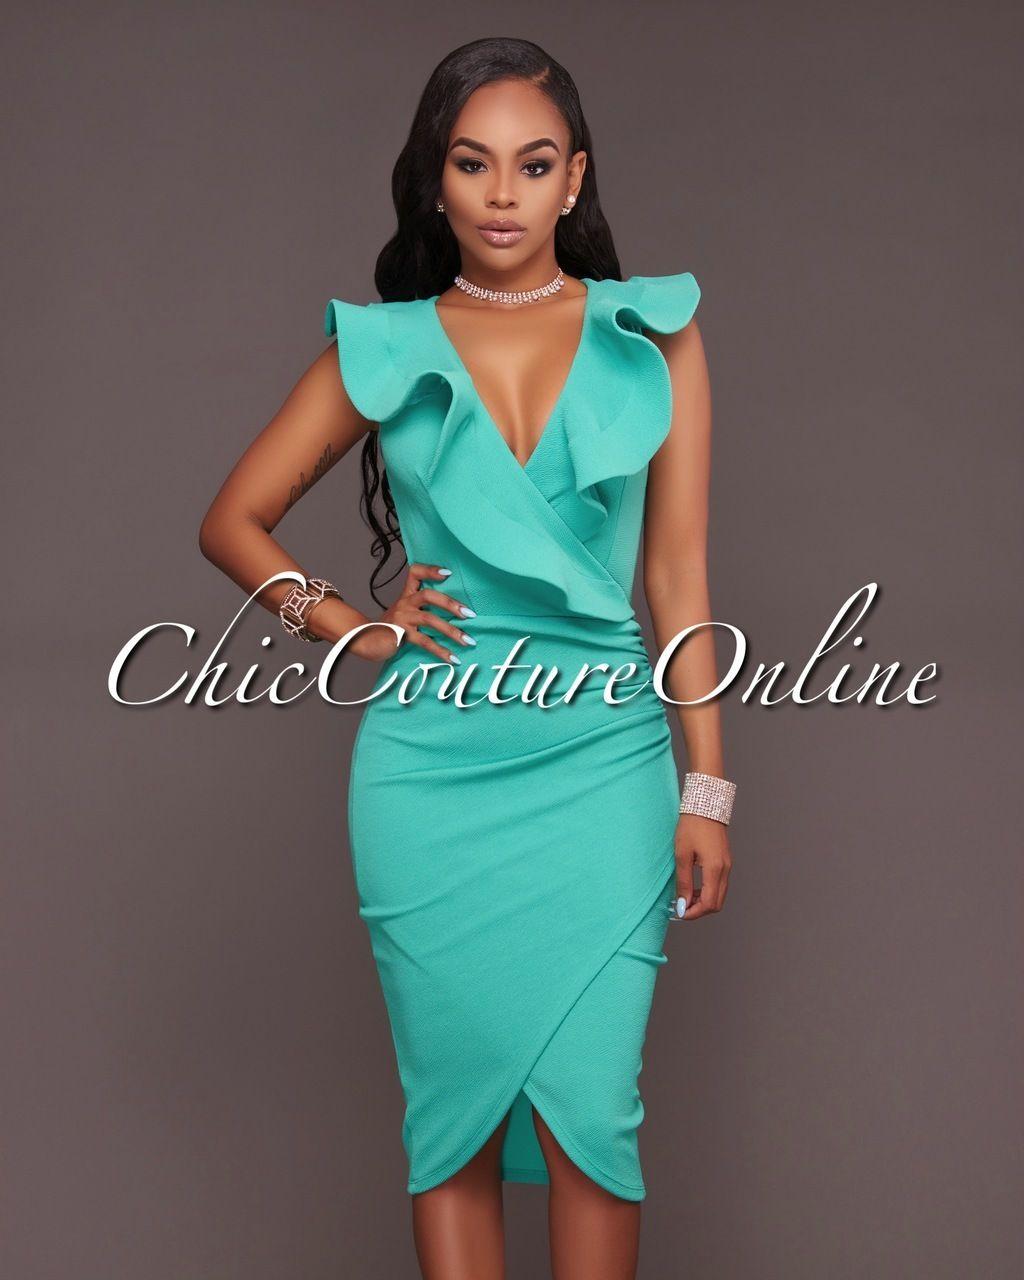 Chic Couture Online - Rachelle Mint Green Ruffle Midi Dress, (http ...